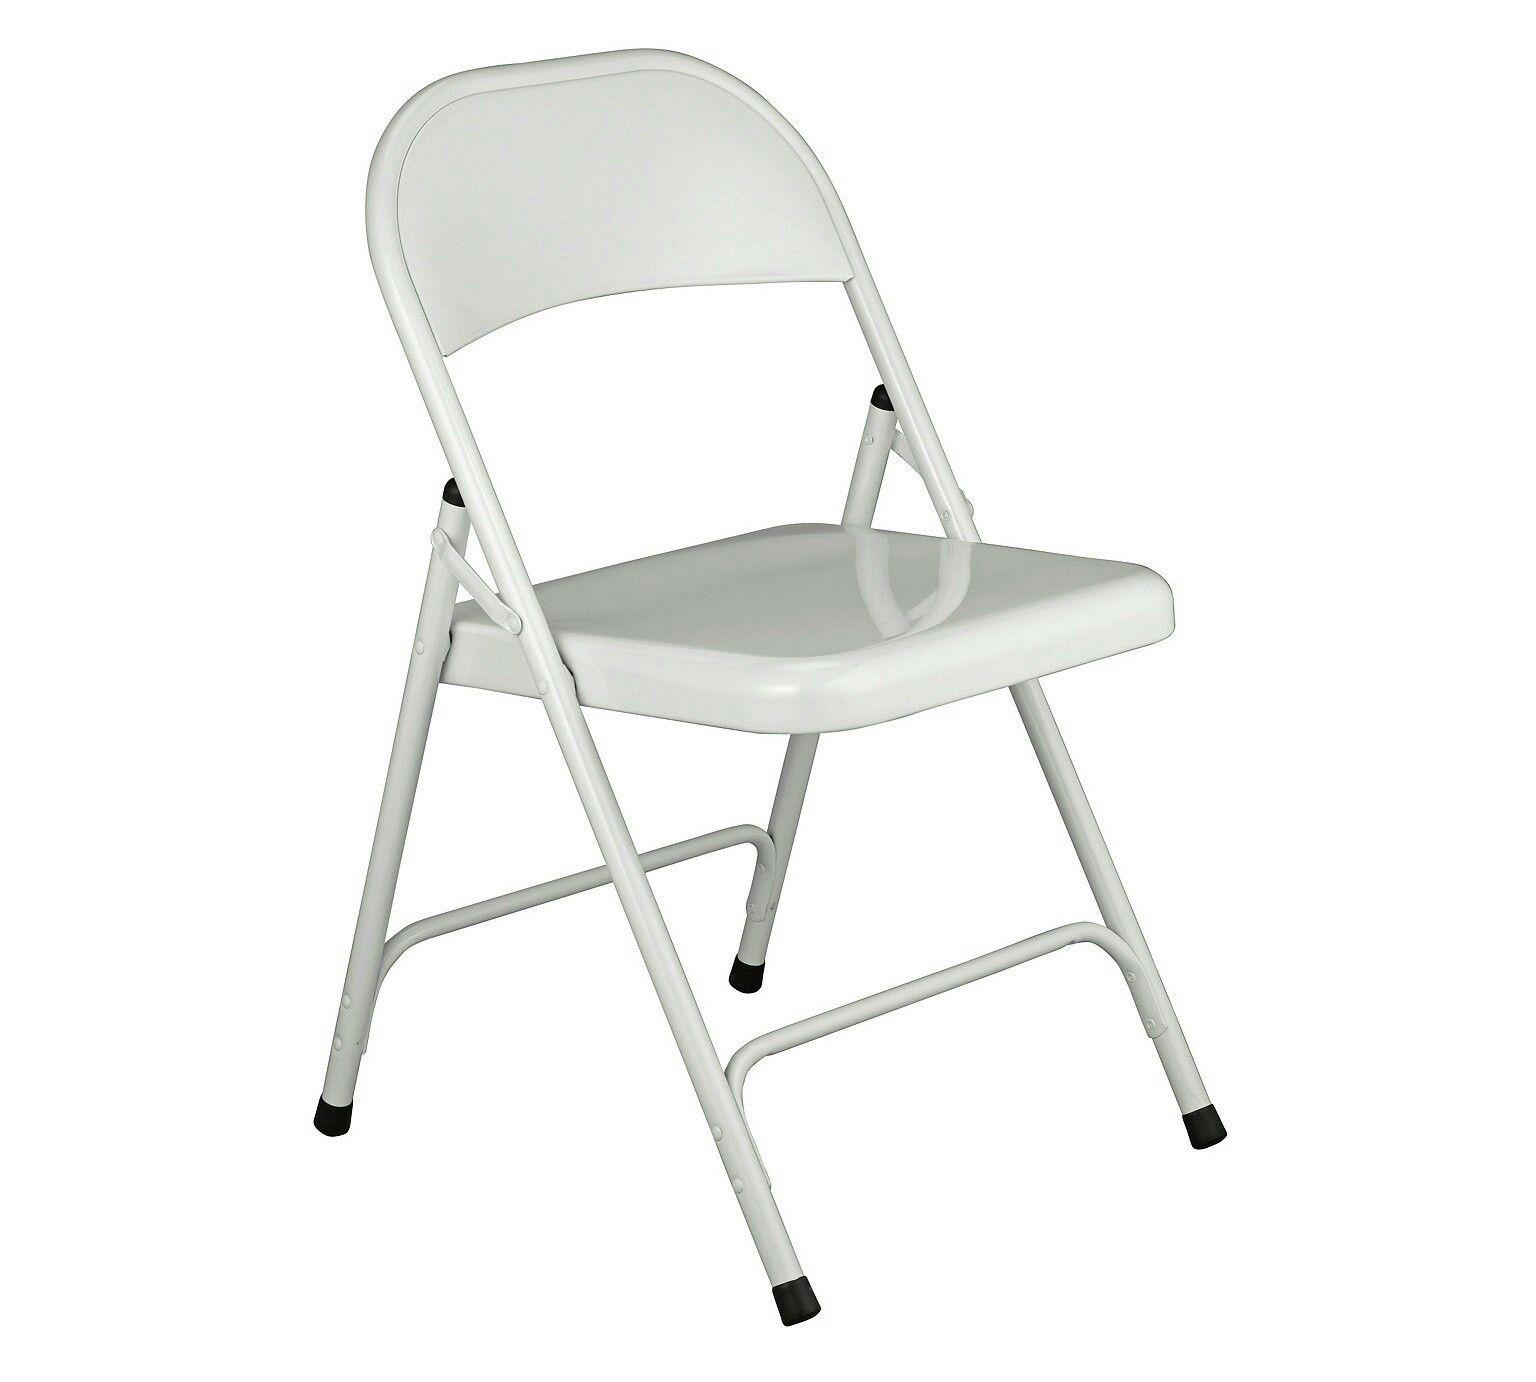 portable chairs argos indoor dining chair cushions habitat macadam folding 10 furniture drawing interior